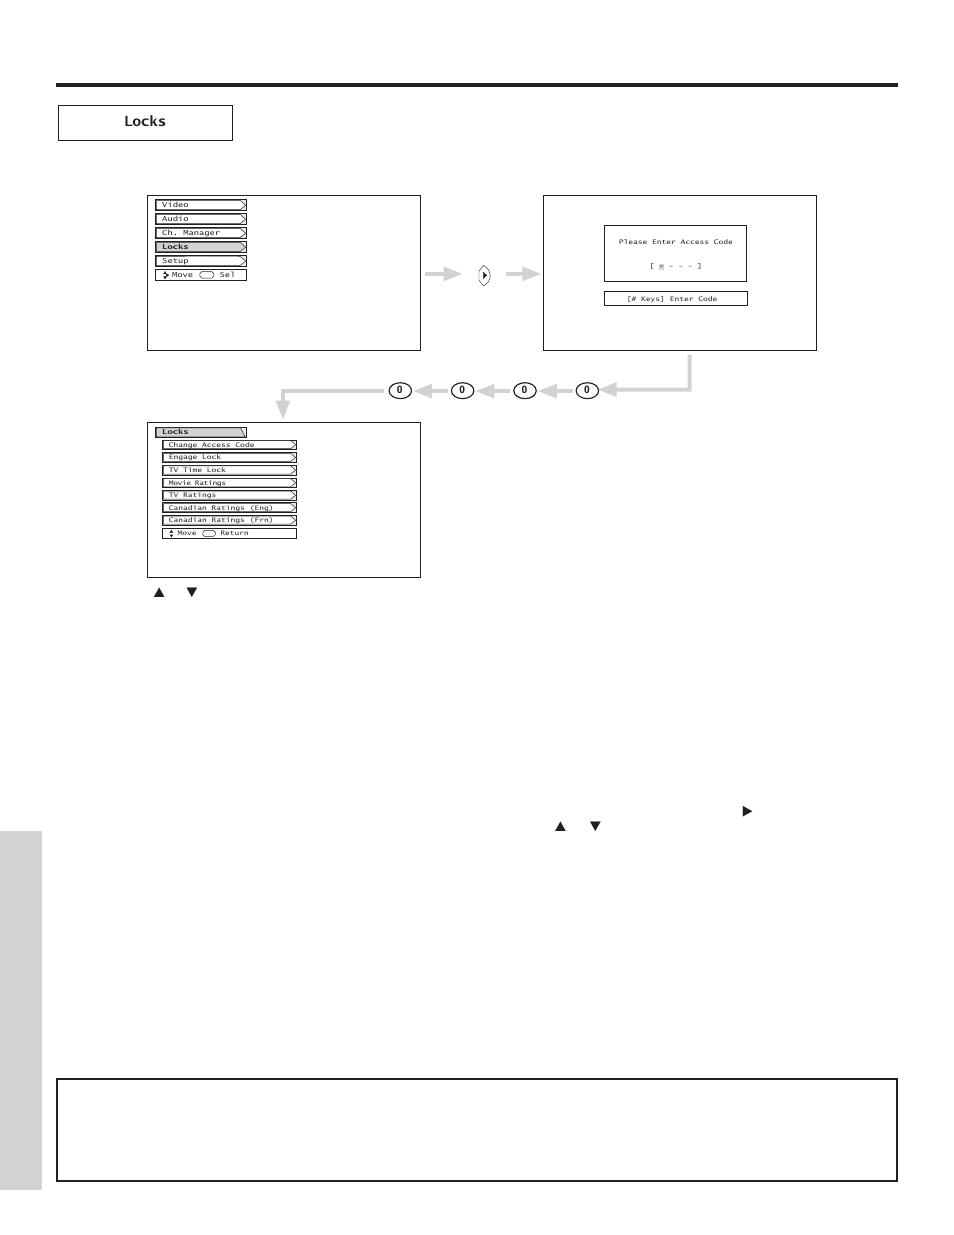 locks on screen displa y hitachi 51f500 user manual page 44 64 rh manualsdir com Hitachi StarBoard Manual Hitachi Manuals Television